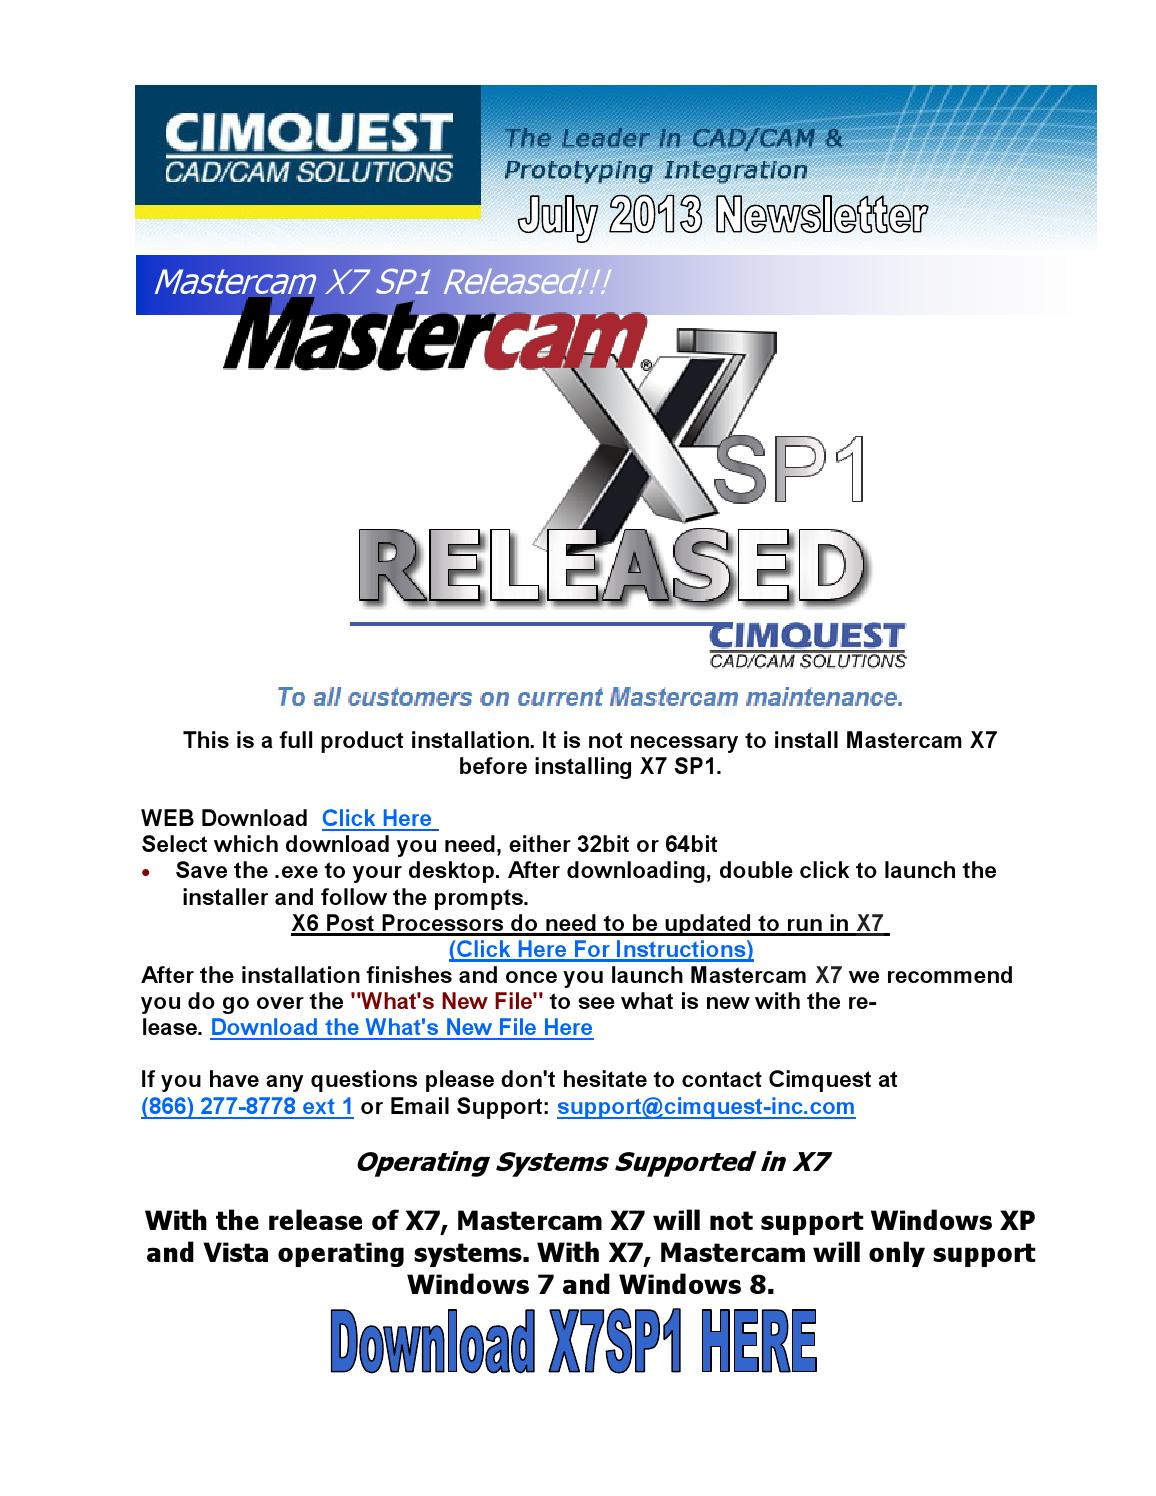 Cimquest Cad/Cam Solutions Mastercam July 2013 by Cimquest